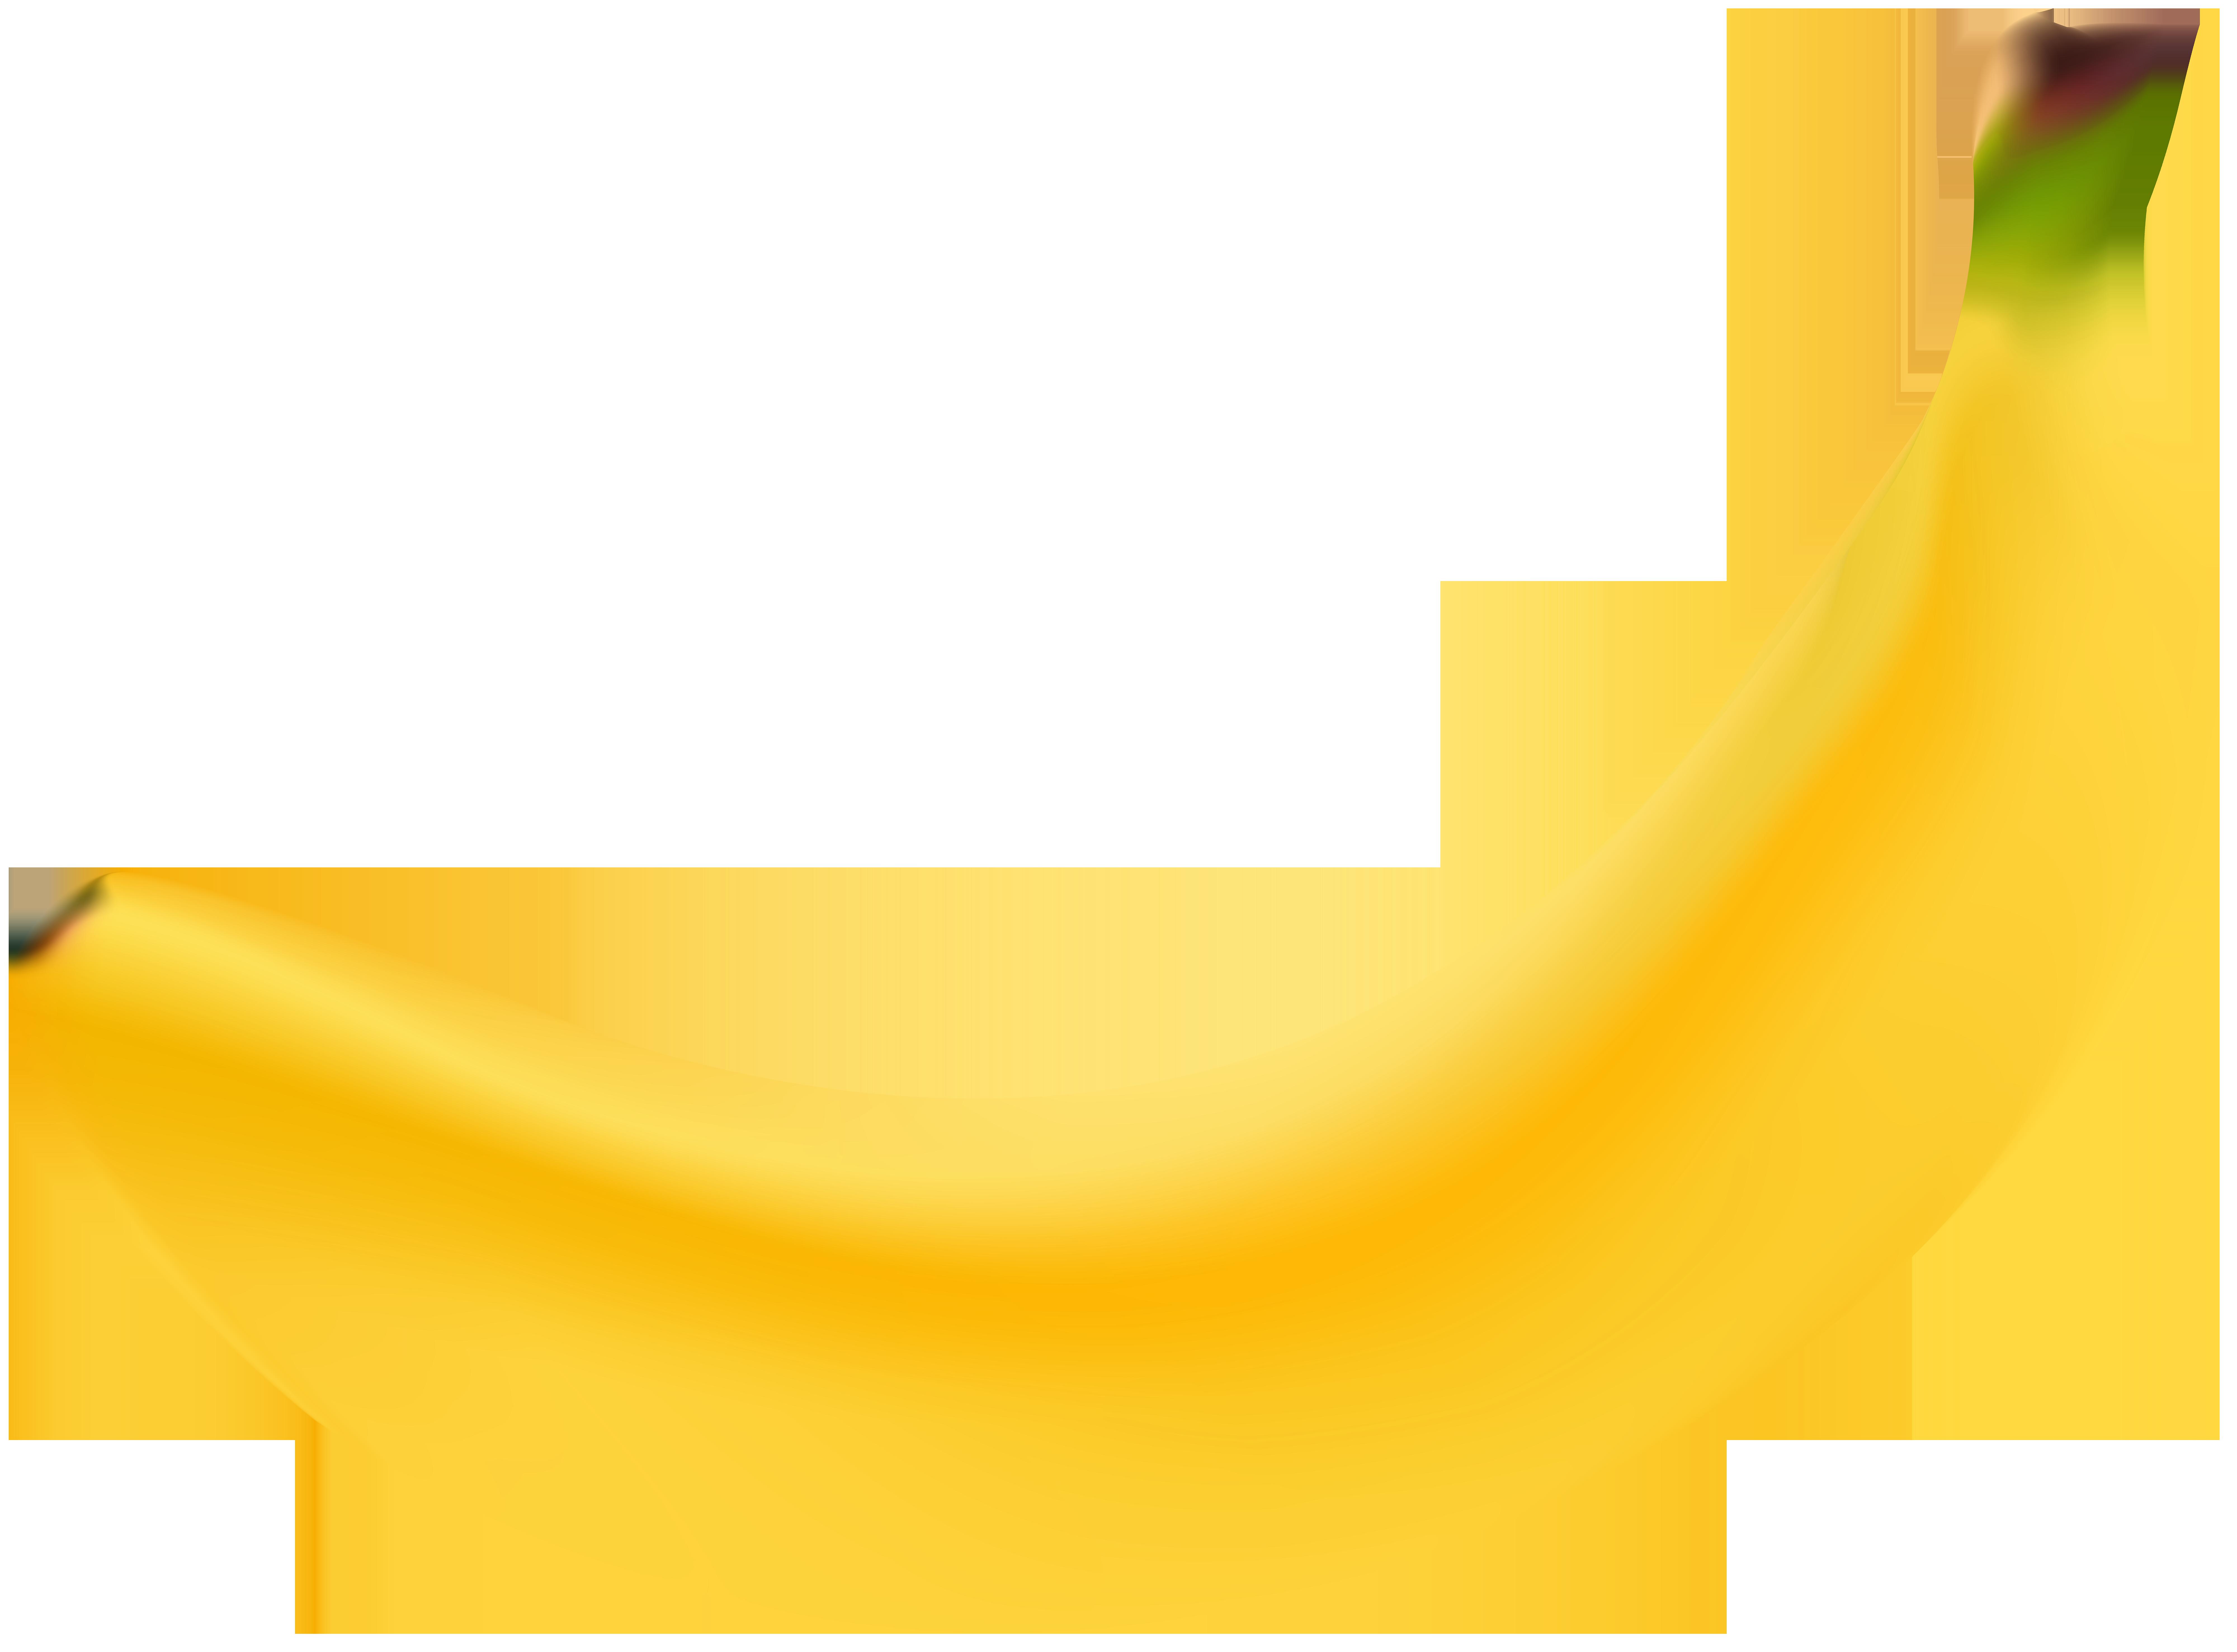 Clipart banana high quality. Transparent clip art image